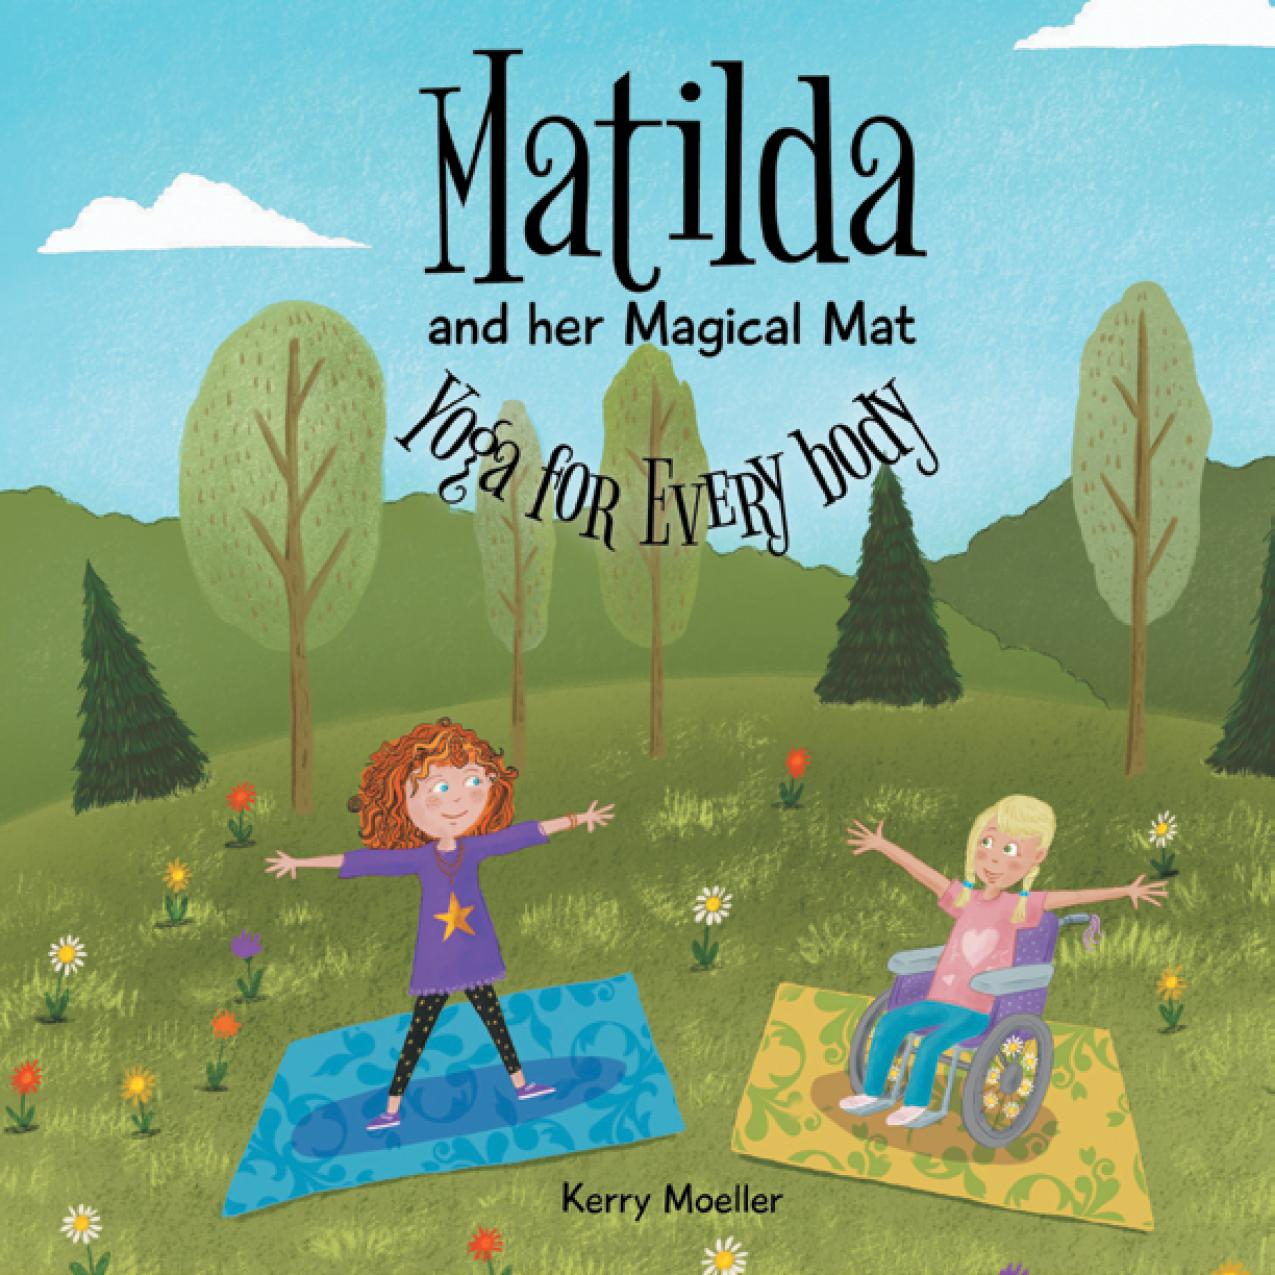 MatildaAndHerMagicalMat_JPRoberts.jpeg